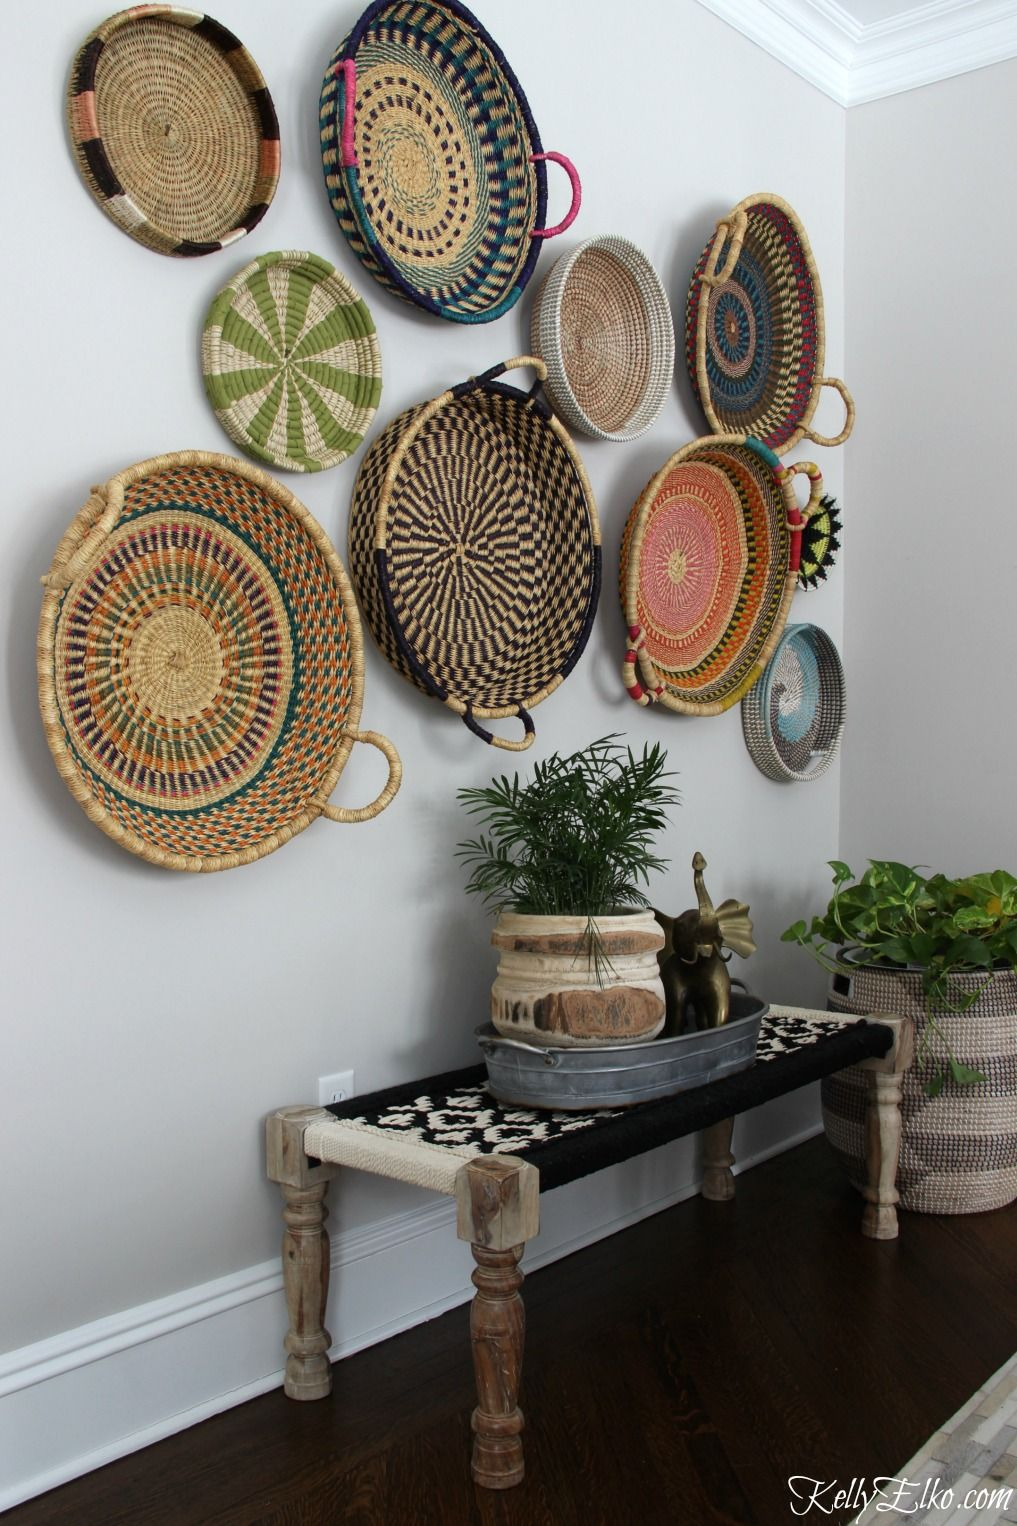 Colorful Basket Gallery Wall Decor Basket Wall Decor Wall Decor